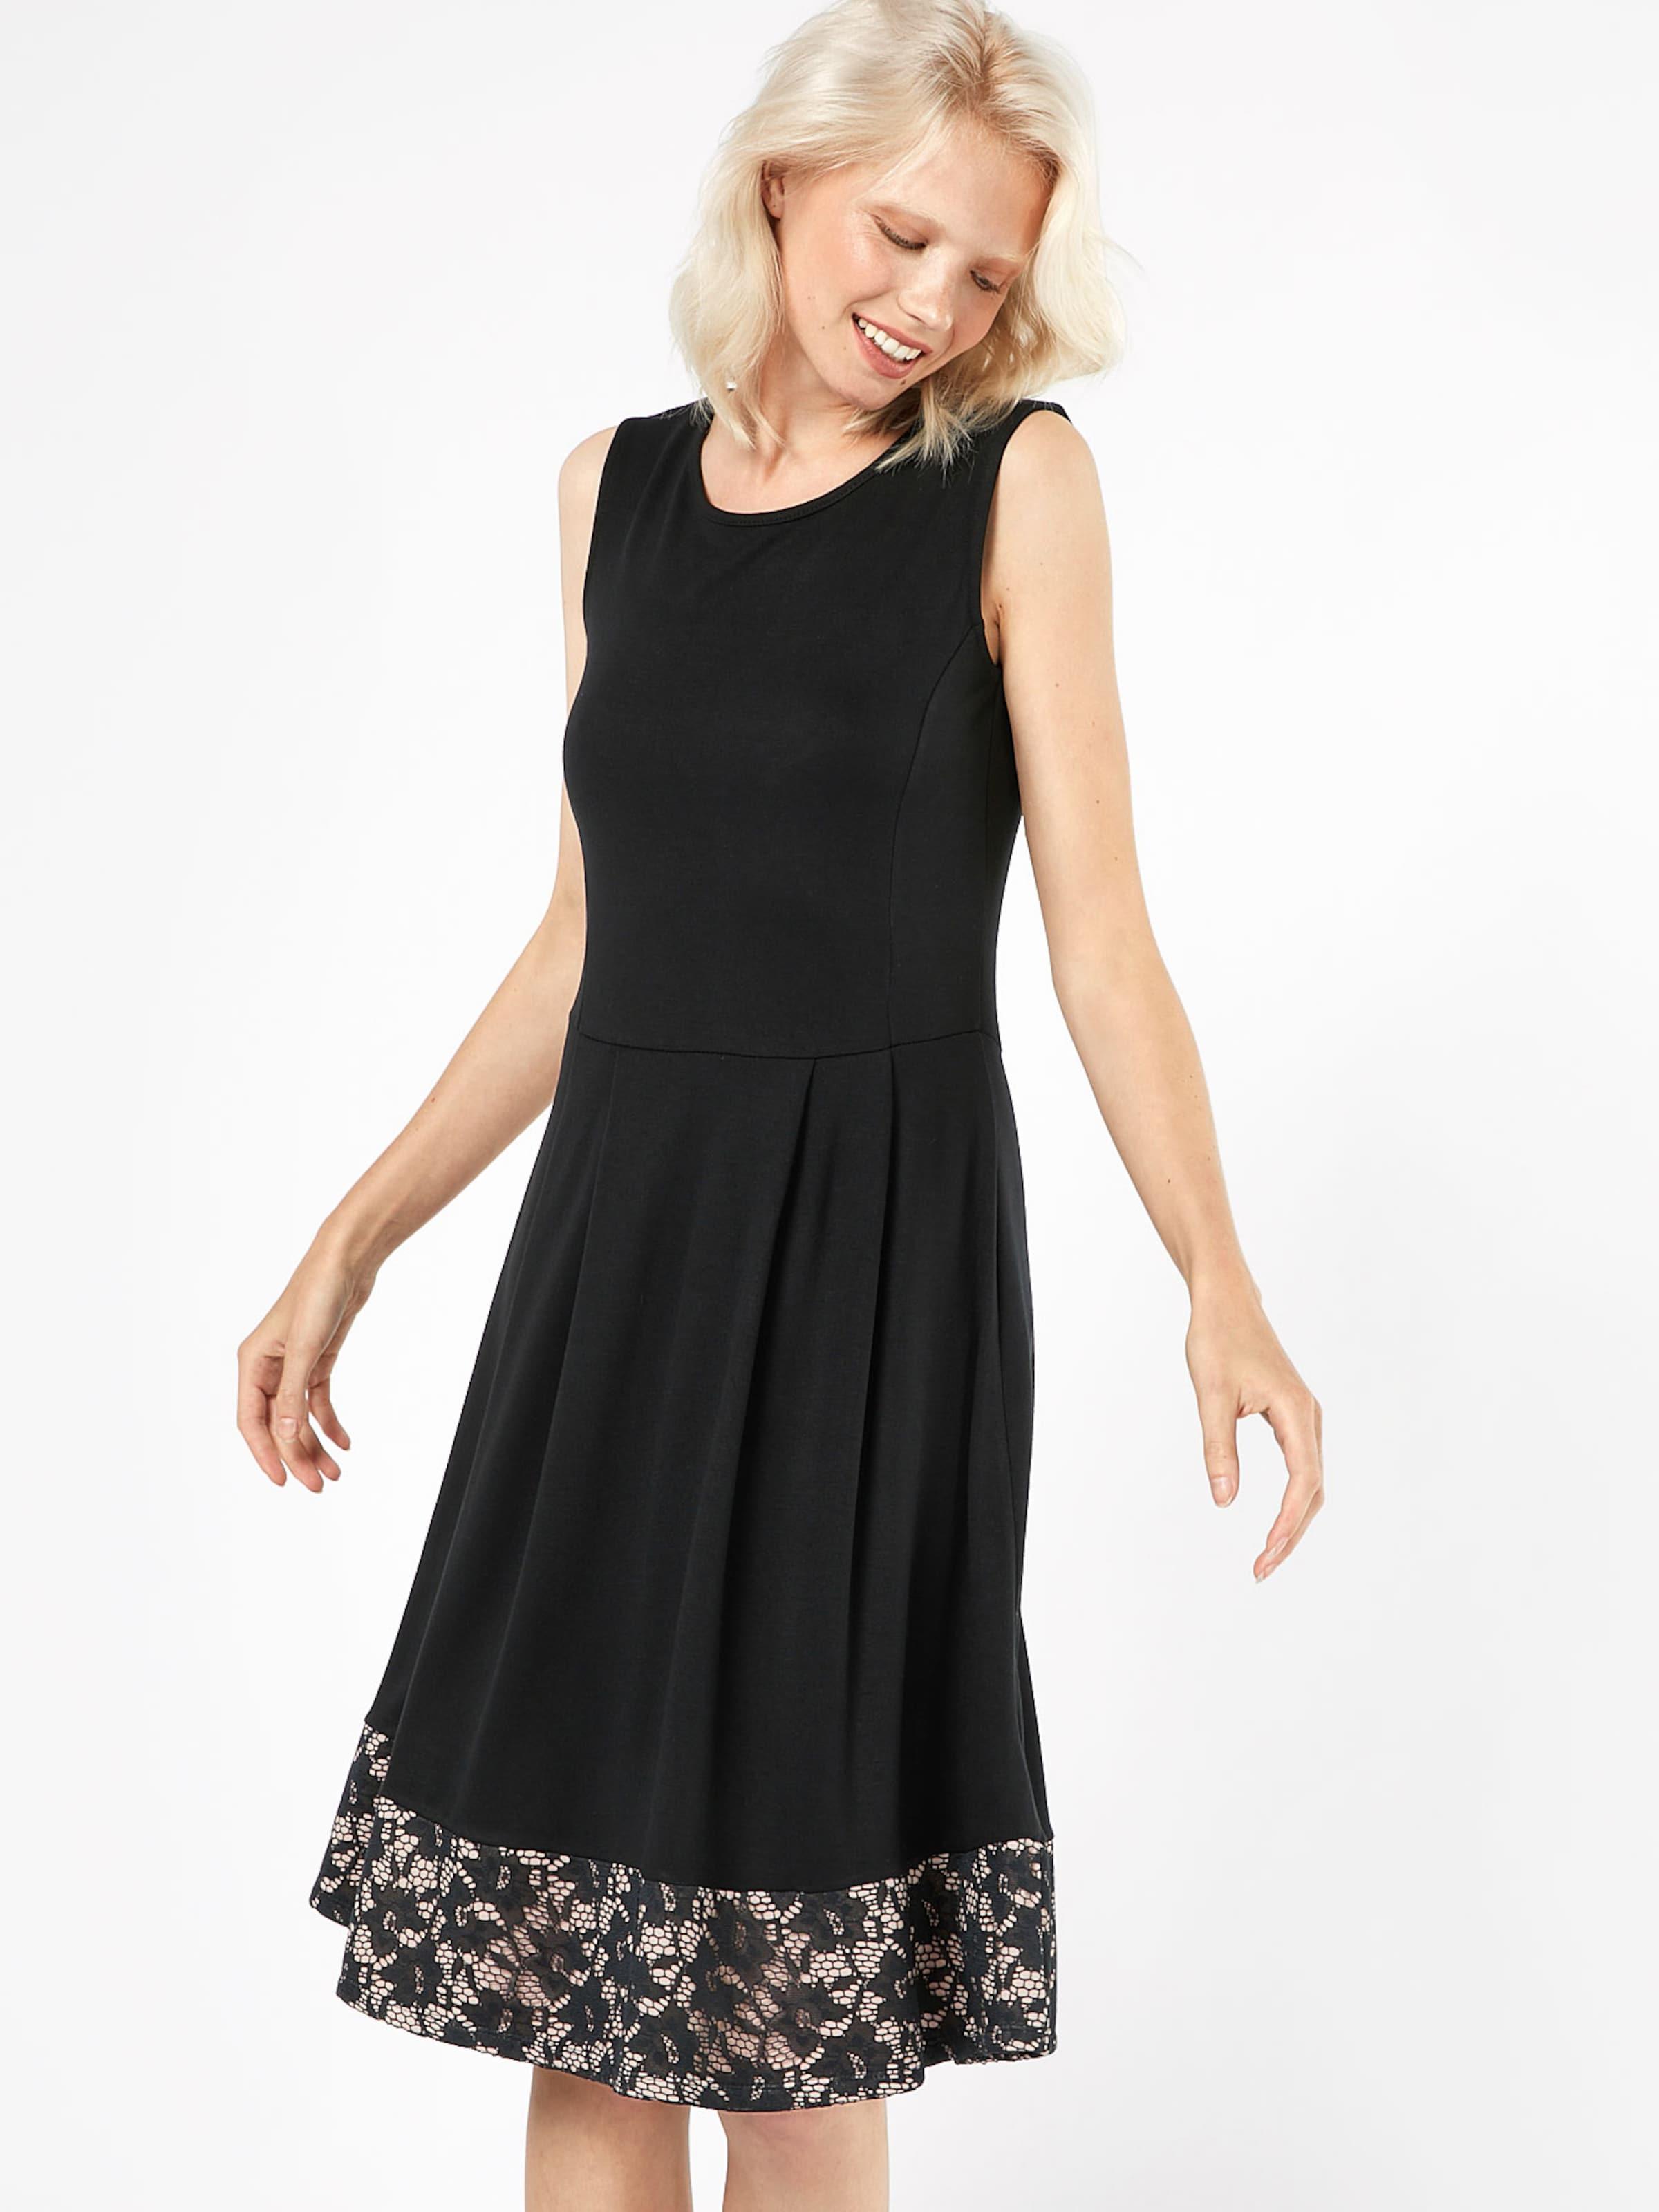 anna & ella Kleid 'Tenea' Billig Verkauf Footlocker Billig Rabatt Authentisch Billig Verkauf Gut Verkaufen Sat Rabatt-Spielraum aE7SNs22Yf